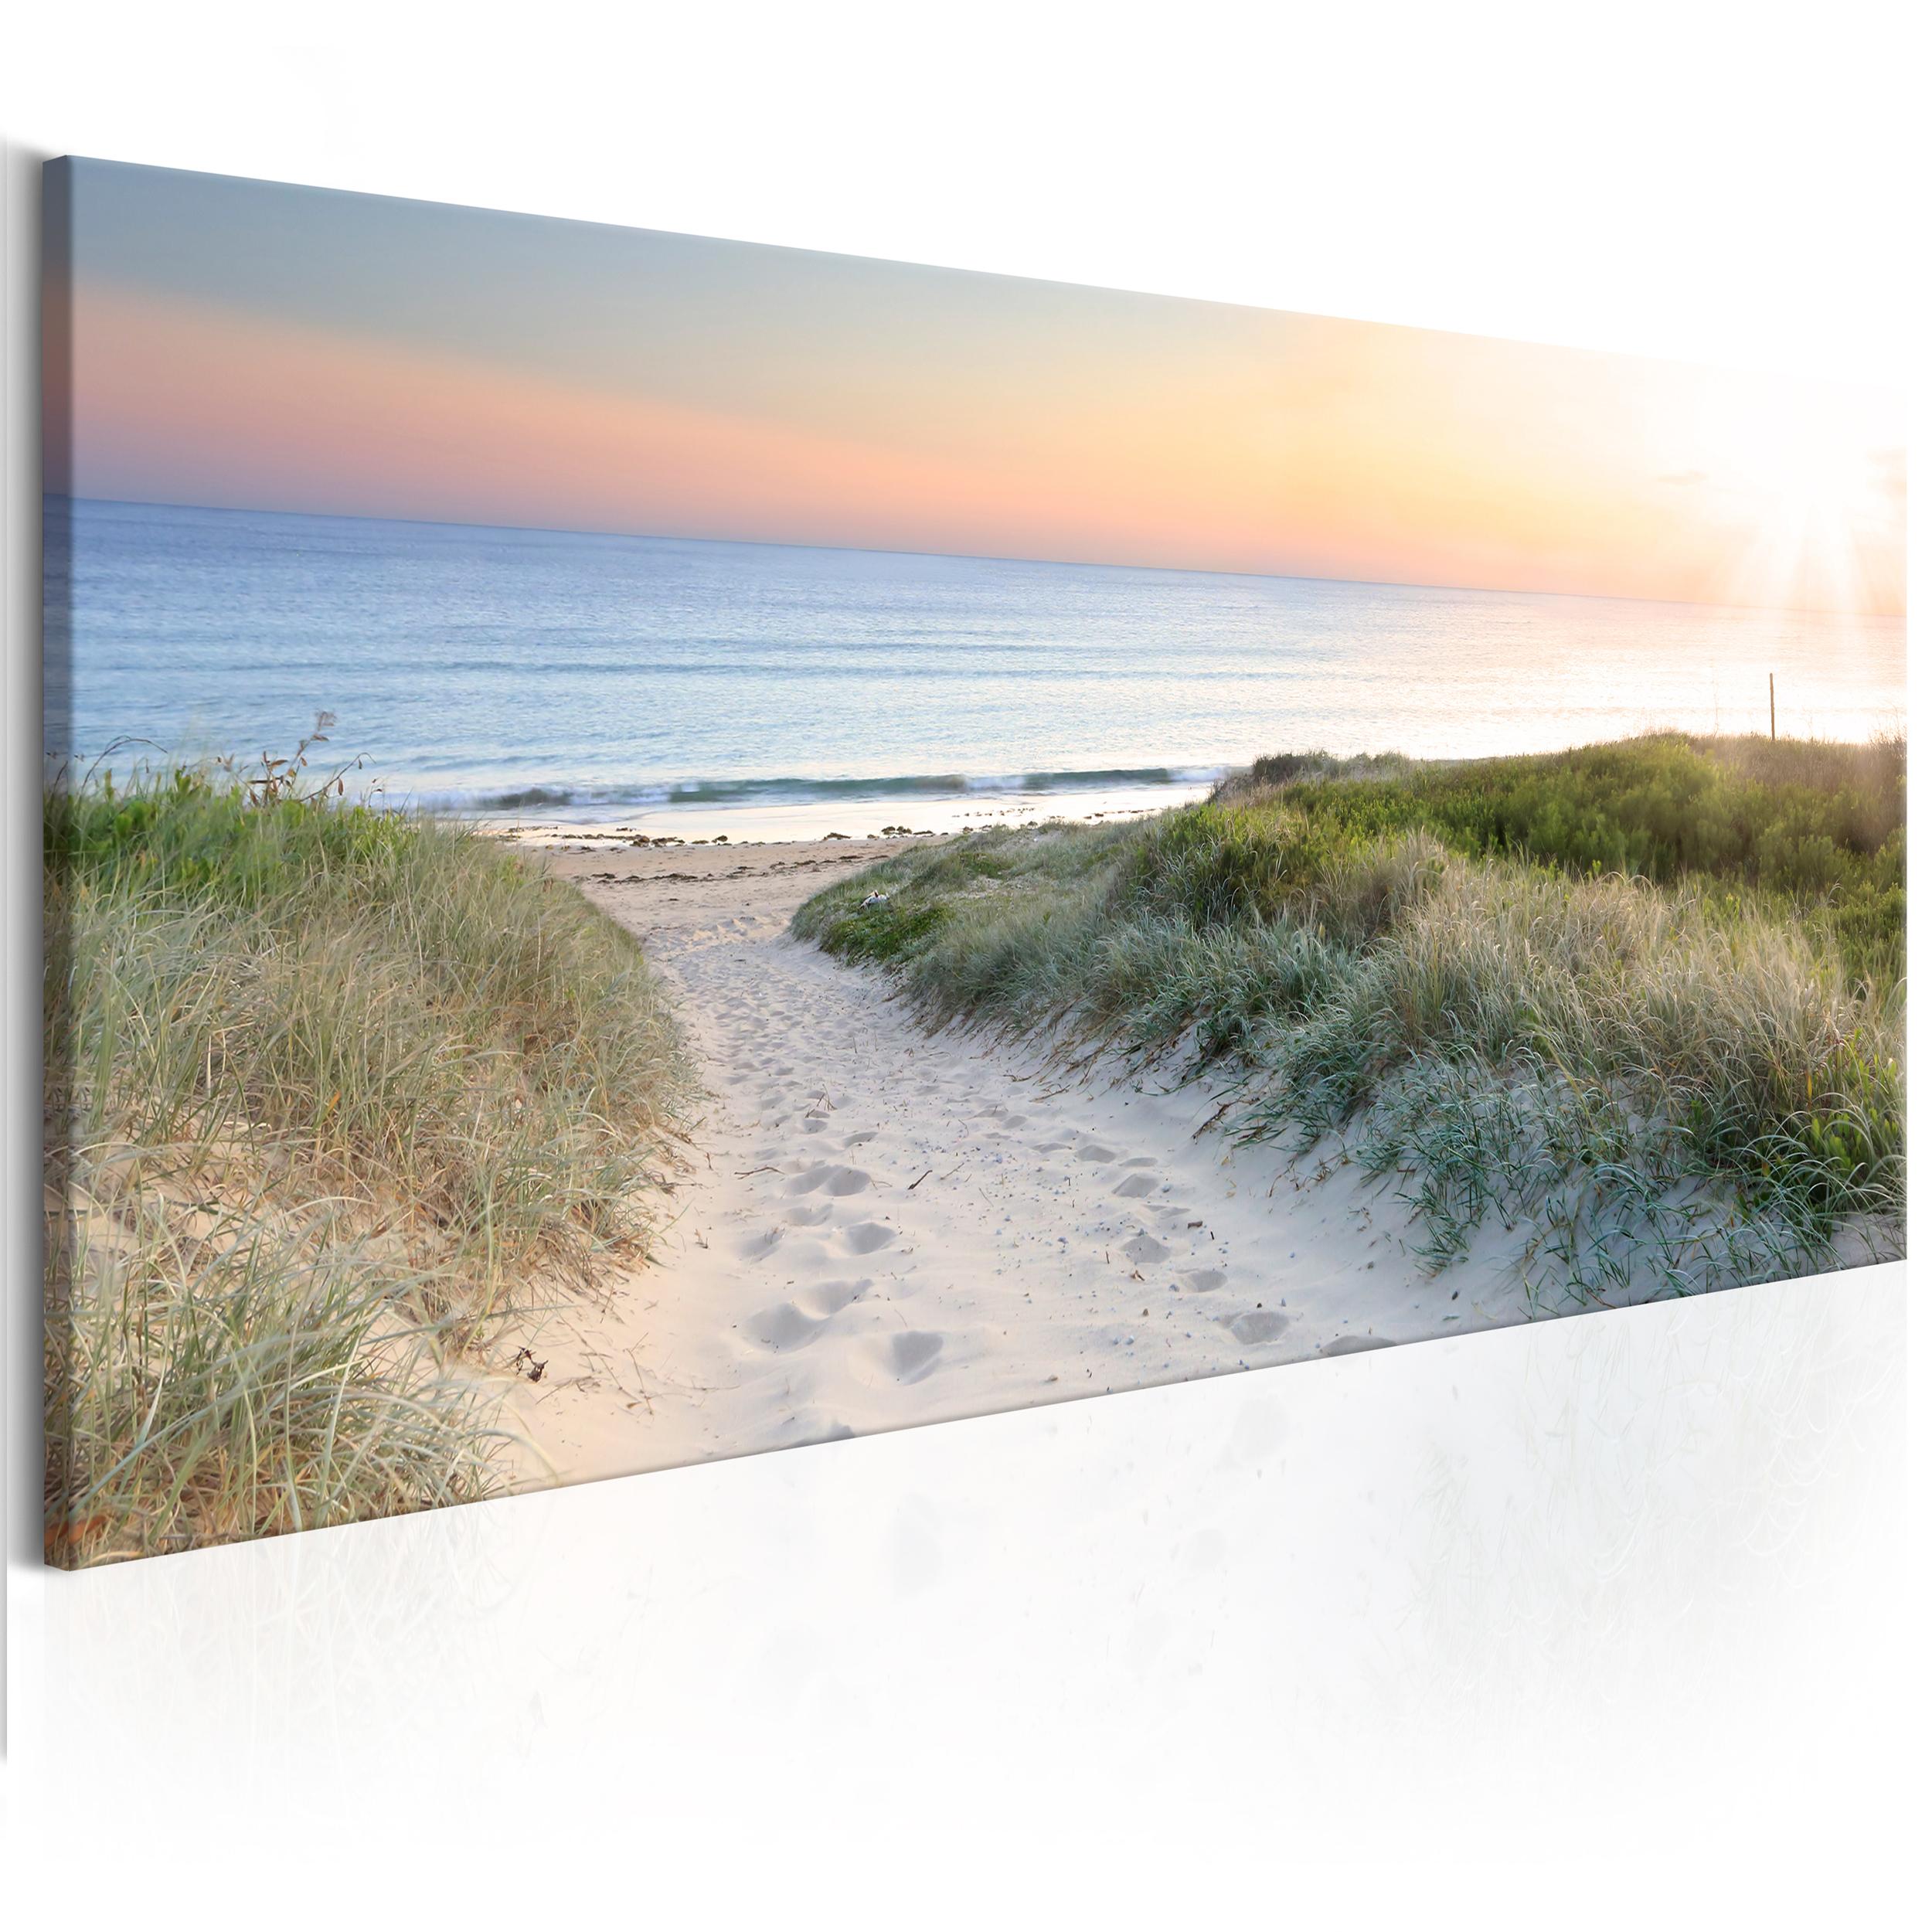 leinwand bilder strand meer wald landschaft gro e wandbilder xxl wohnzimmer 05 ebay. Black Bedroom Furniture Sets. Home Design Ideas